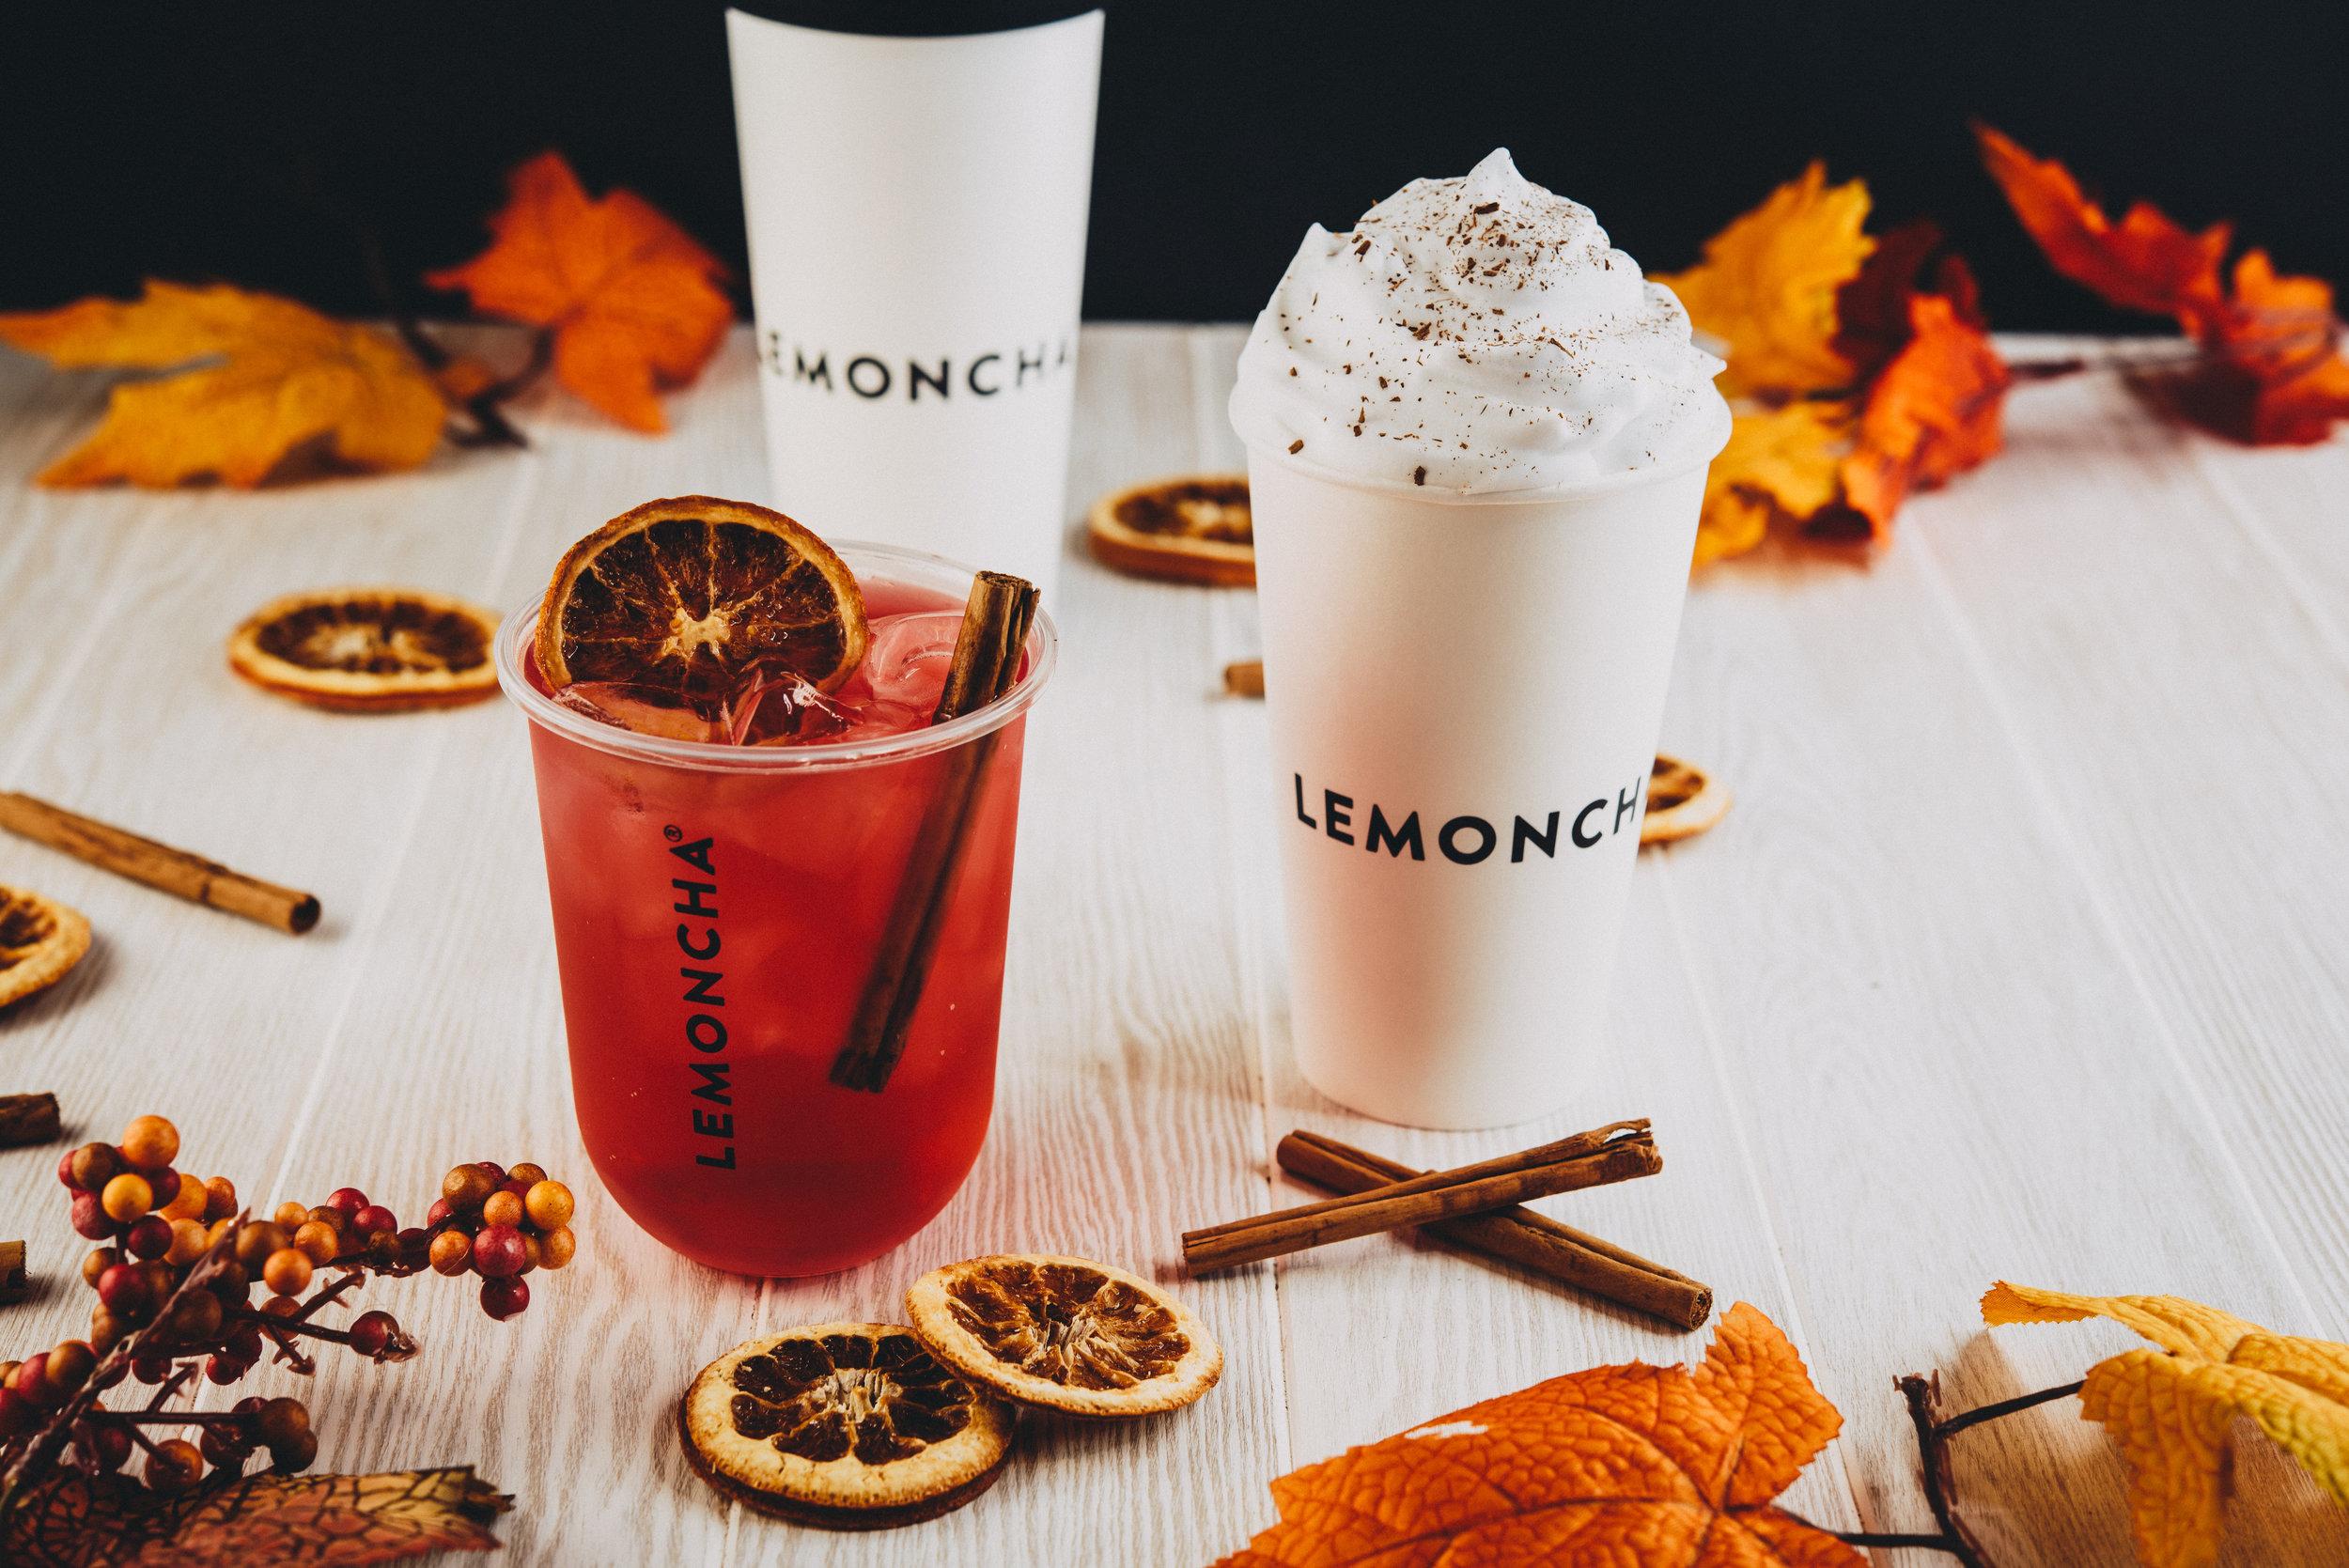 Lemoncha Limited Fall Drinks 2018